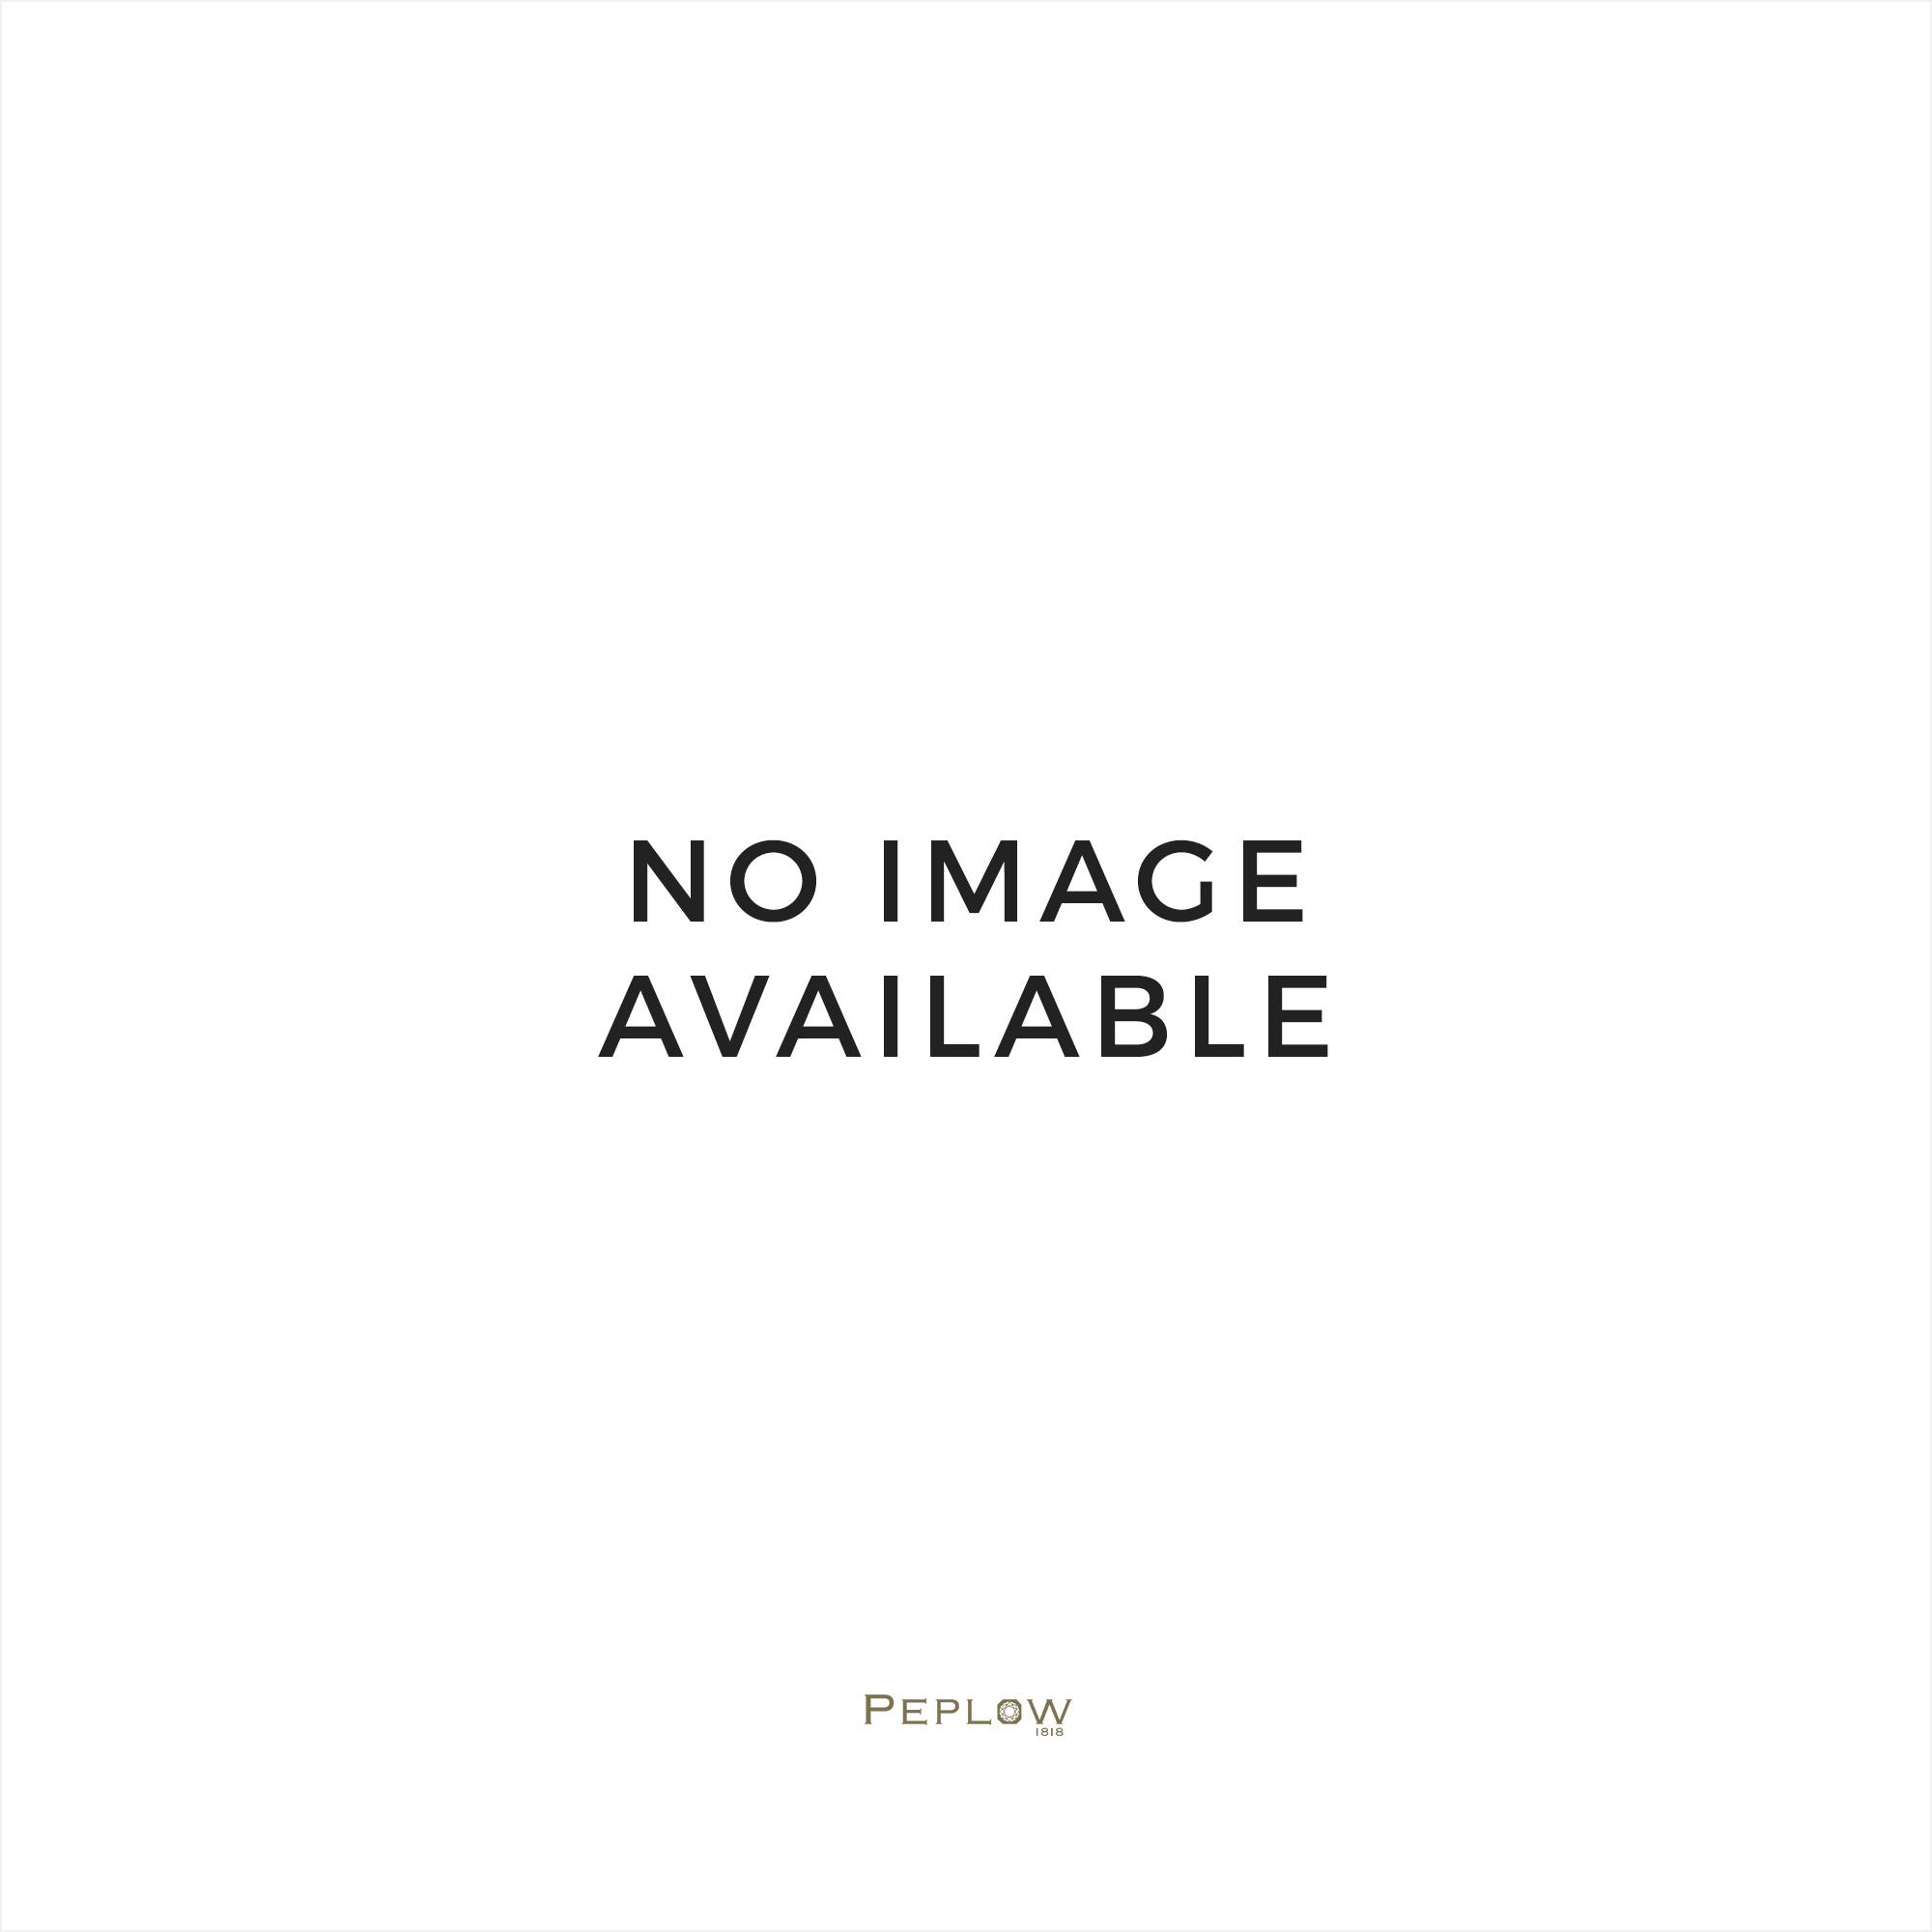 Lorus Ladies steel Lorus quartz bracelet model, ref RG265KX9